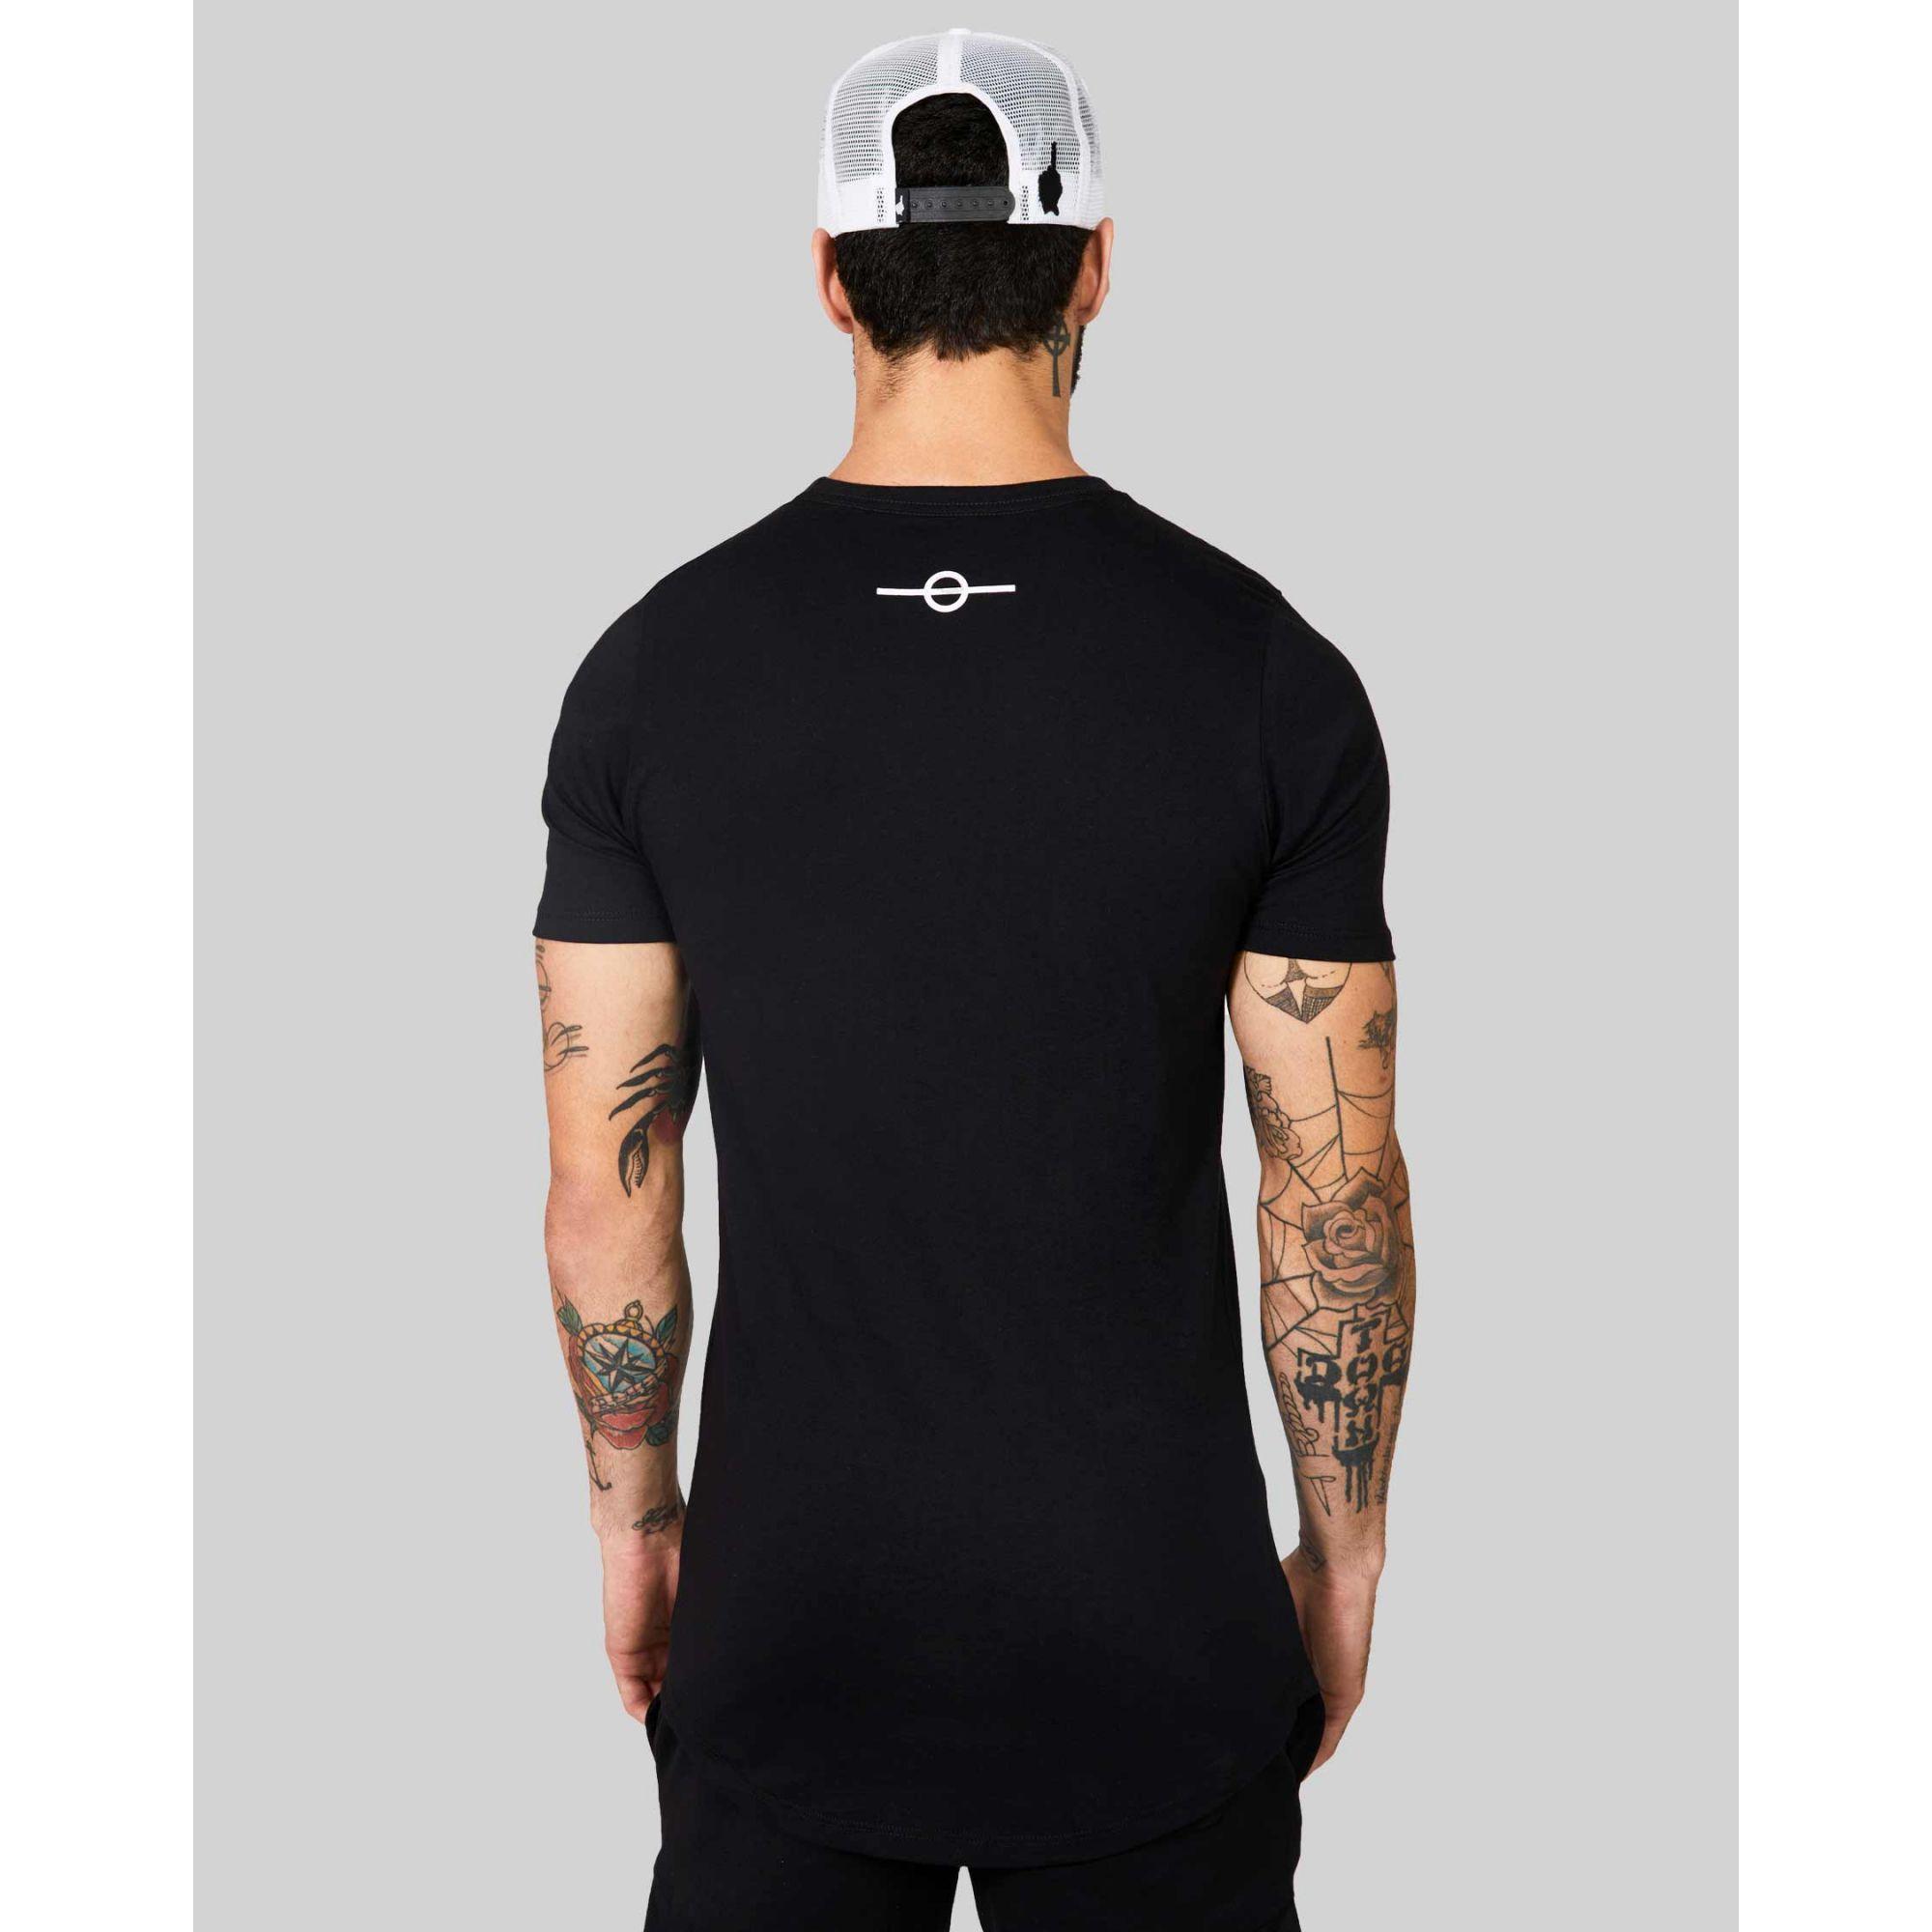 Camiseta Buh Gálatas Black